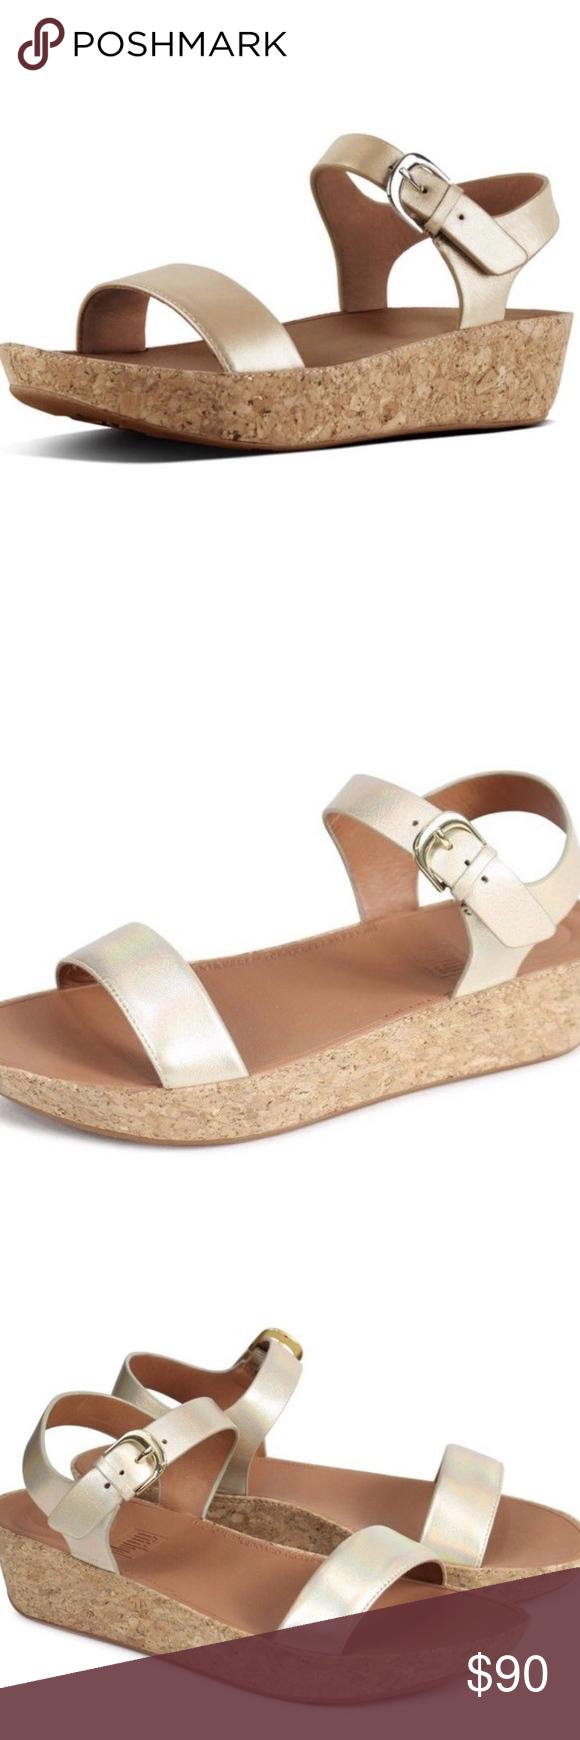 238cc8d82311 Fitflop Bon II Back Strap Sandals Size 8 Gold Fitflop Bon II Back Strap  Sandals Size